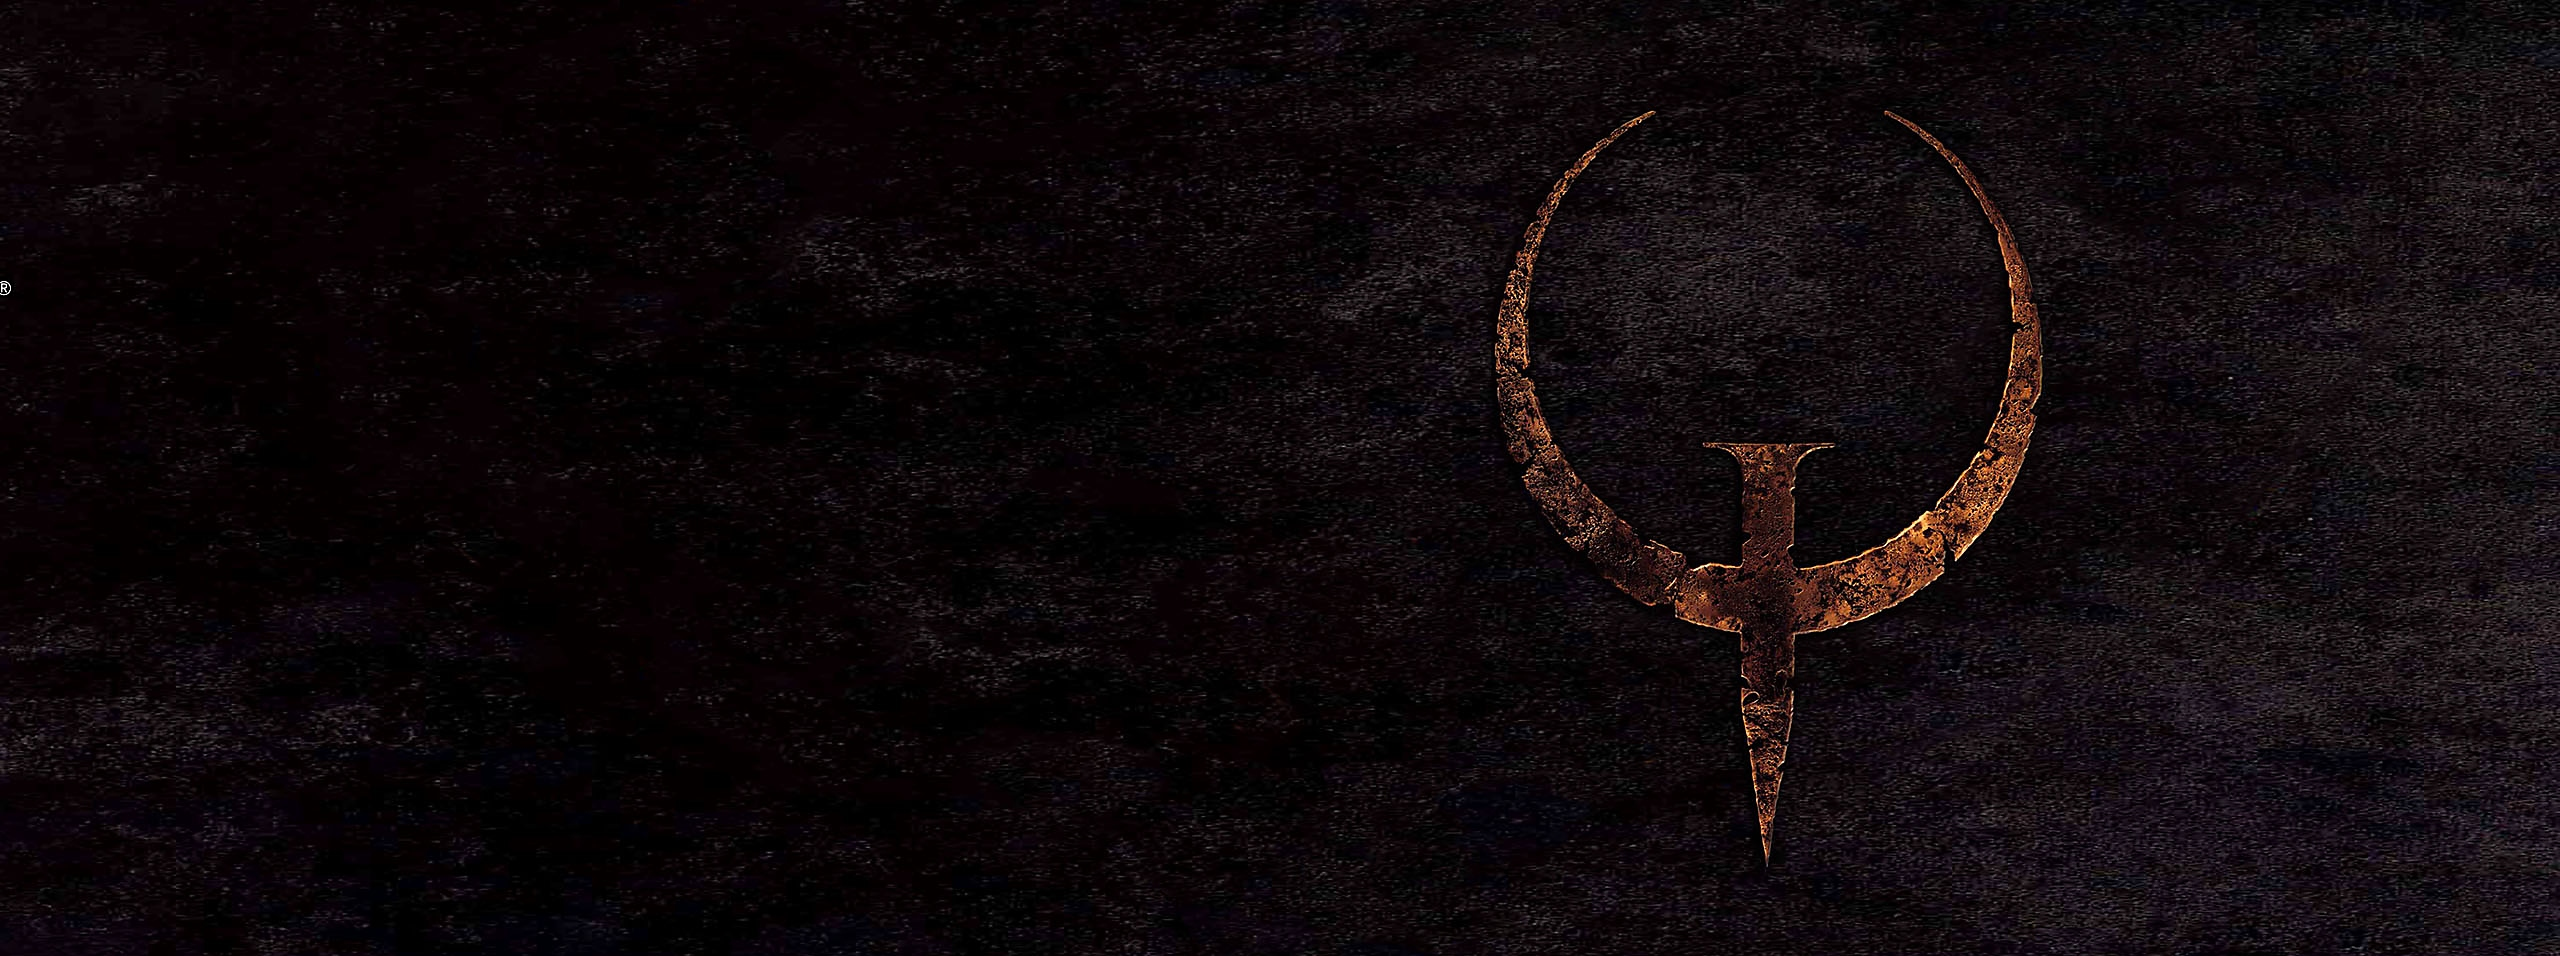 Quake key-art